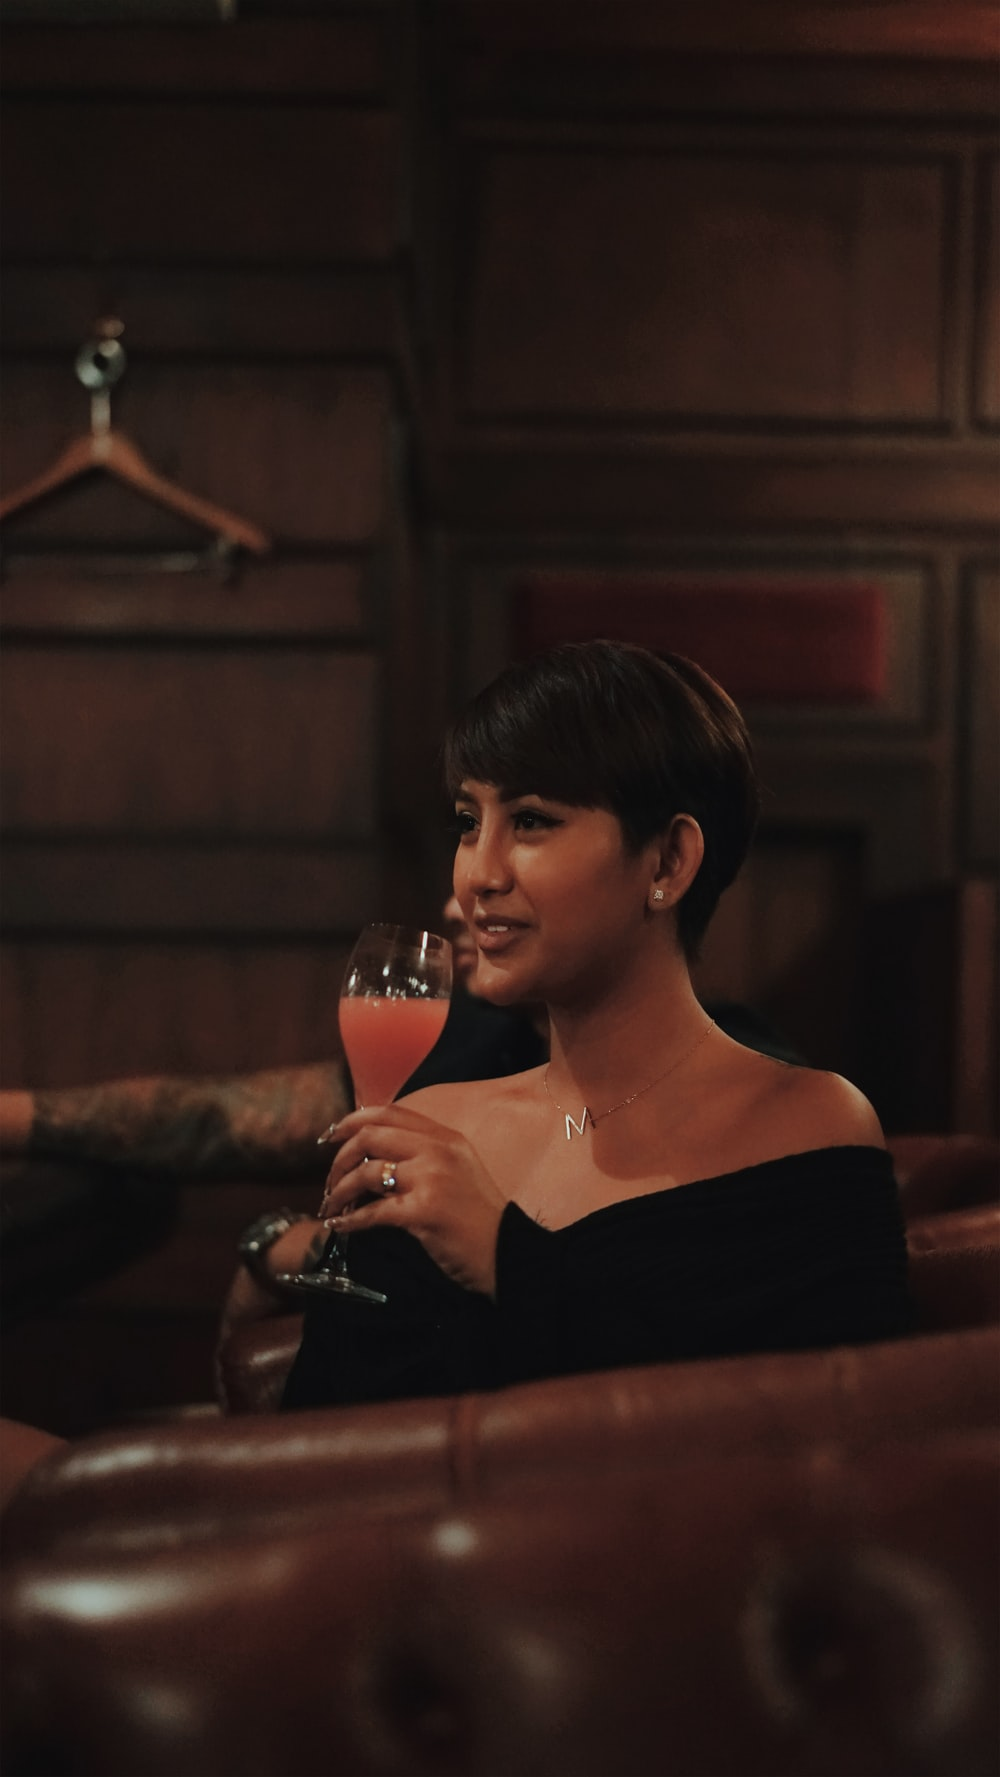 woman in black off shoulder dress holding wine glass